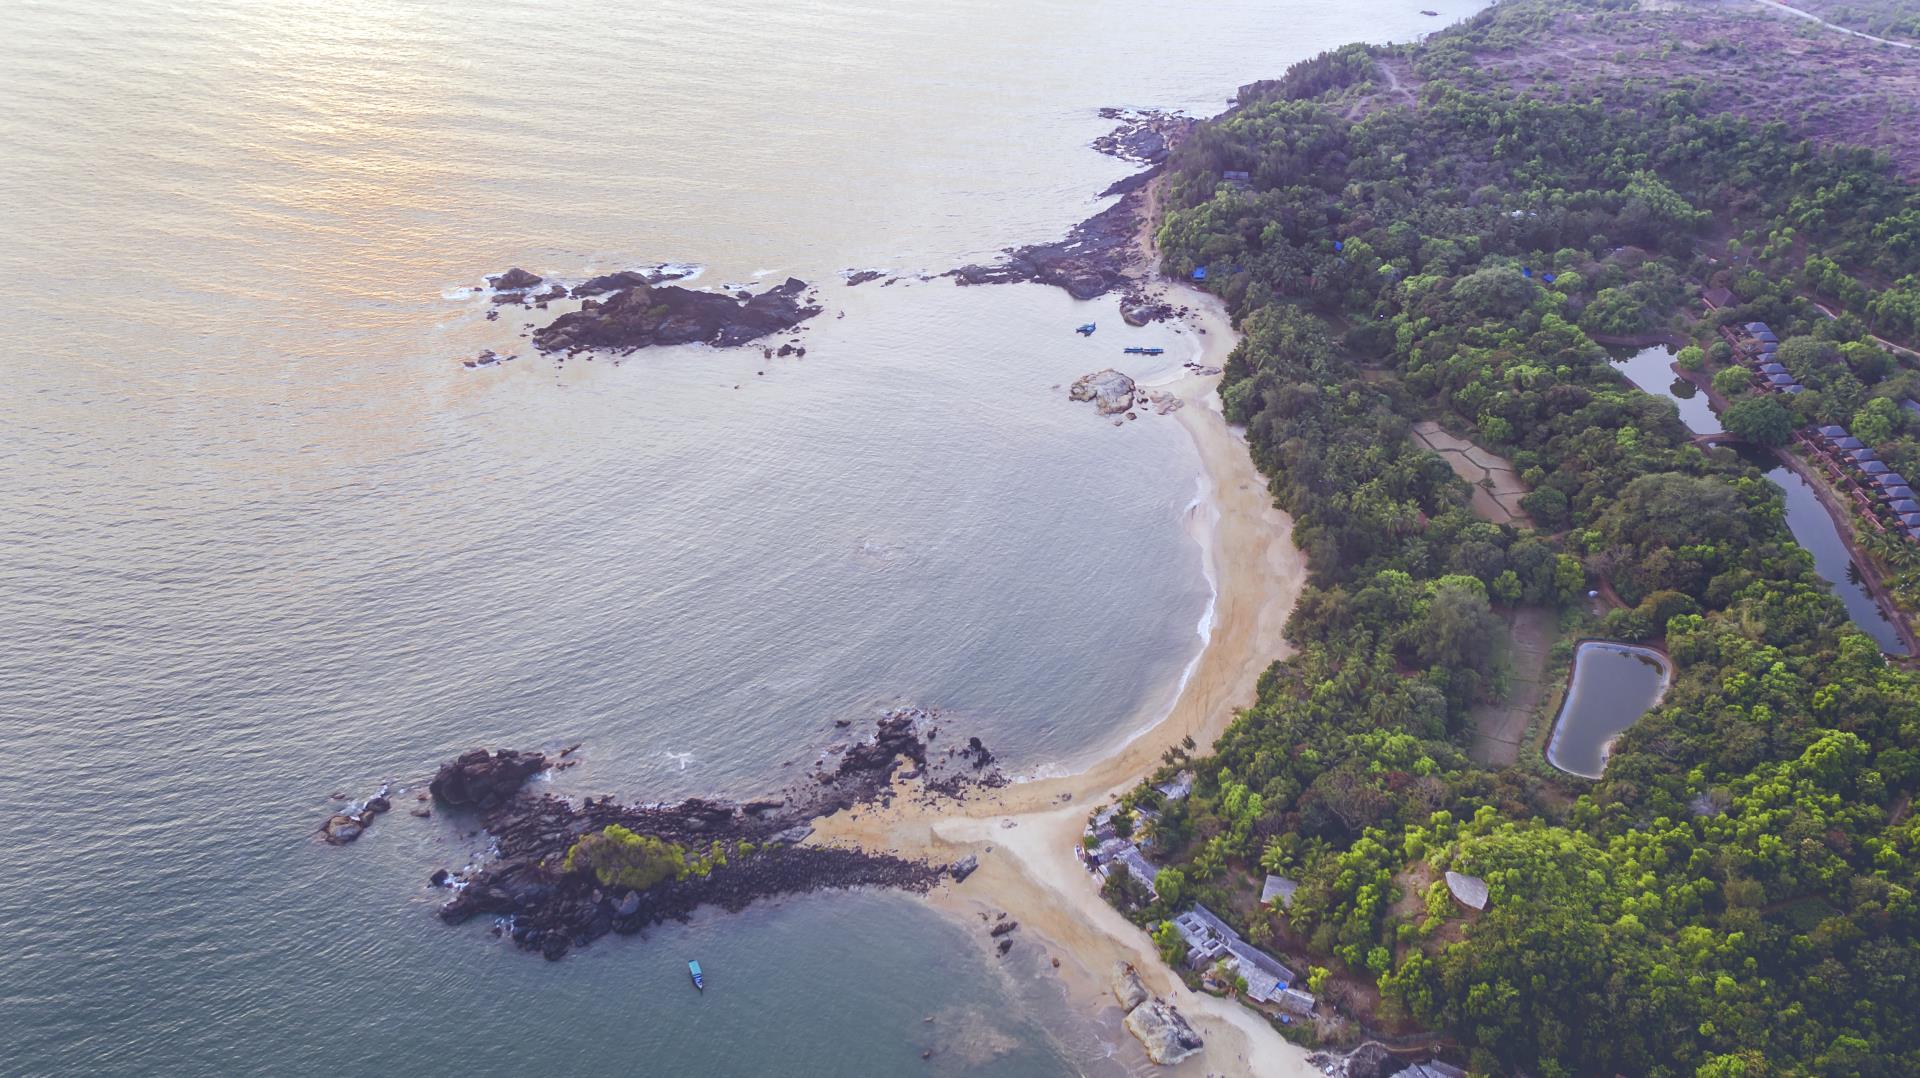 Kochi to Goa Tour - The Malabar Coast 7